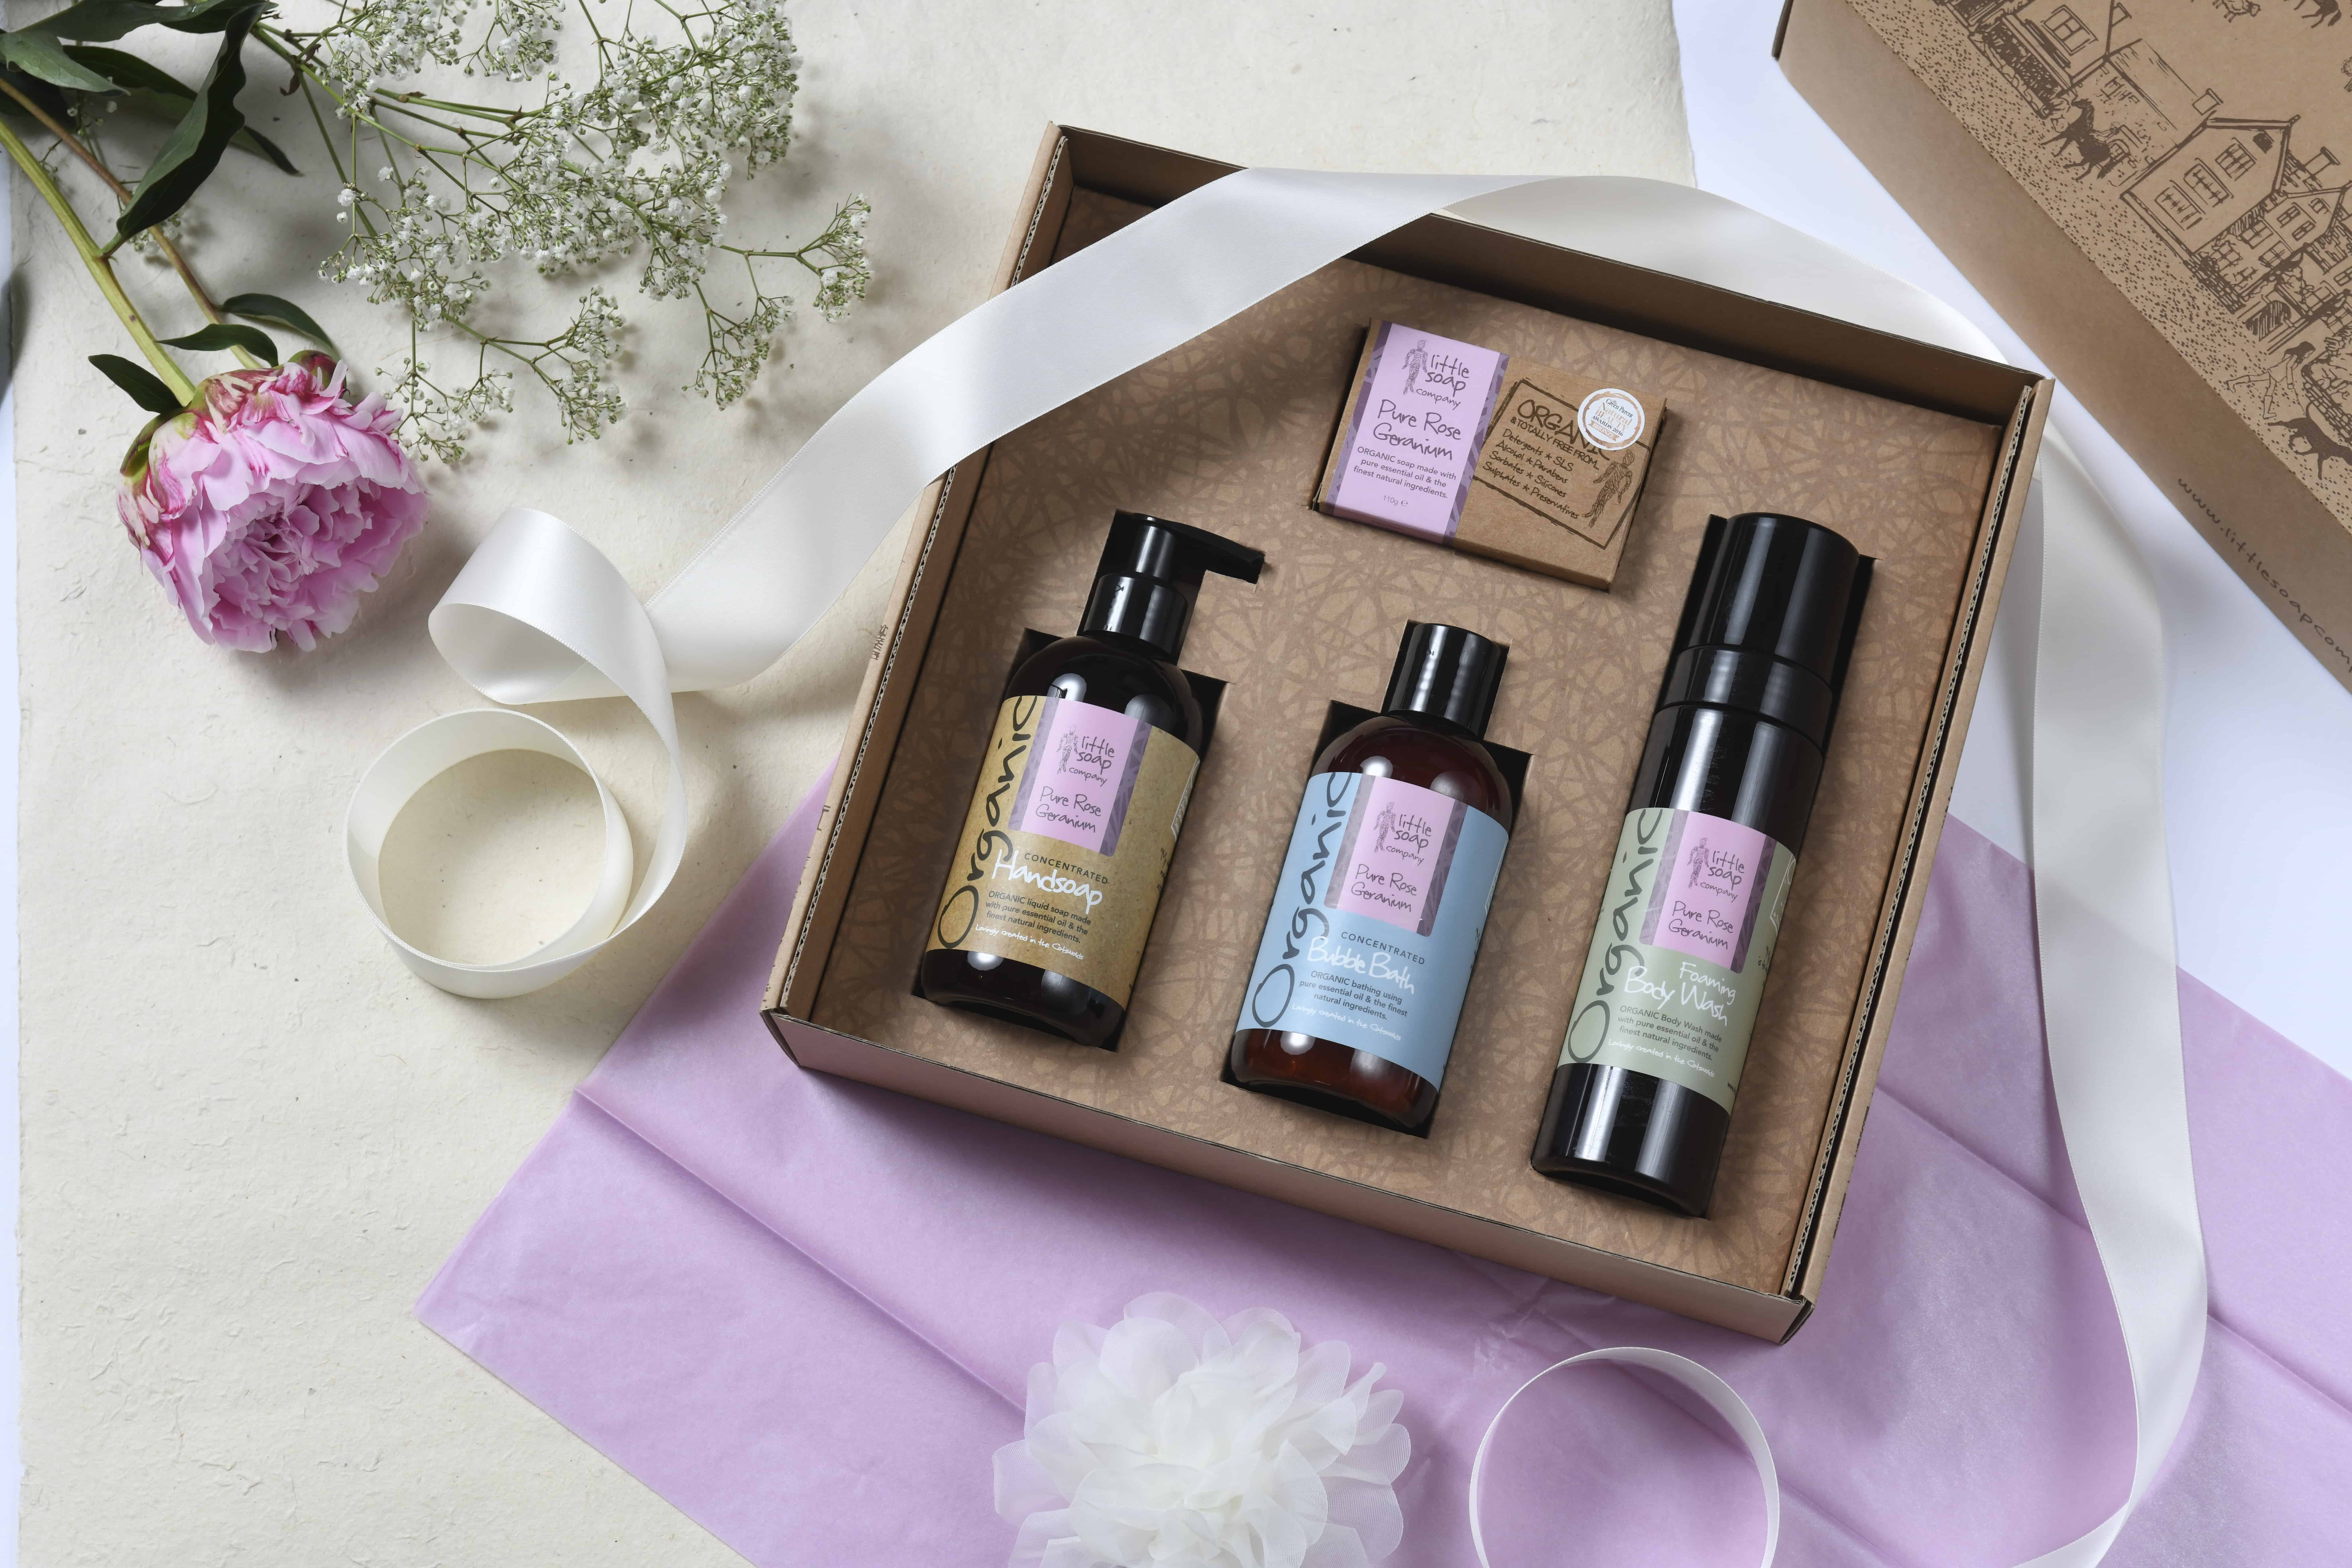 Three Little Last Minute Gift Ideas_ Little Soap Company.co.uk